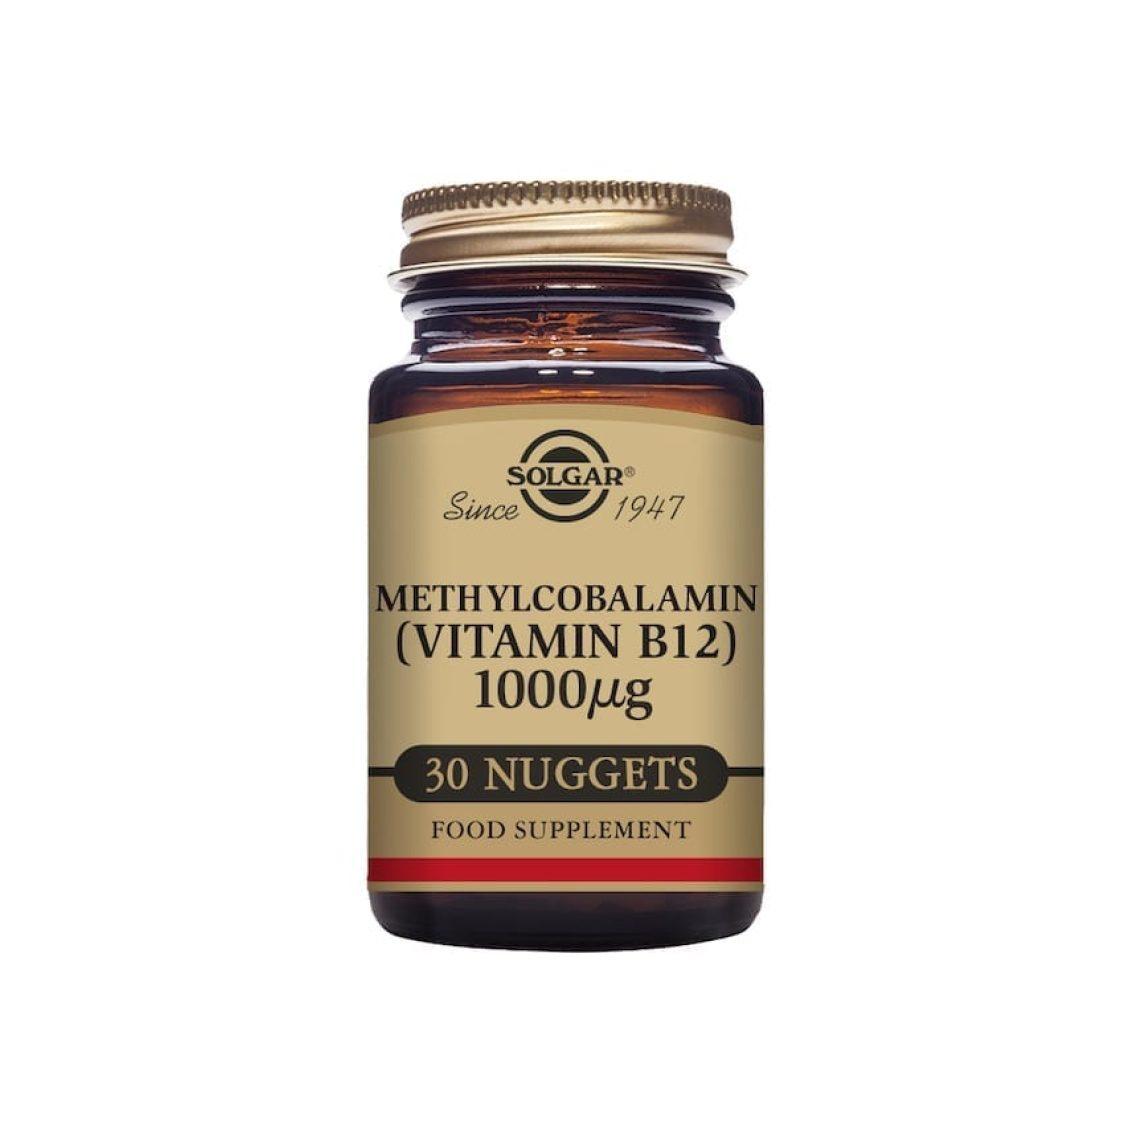 Solgar - Vitamin B - Methylcobalamin 1000 mcg Nuggets  - Size: 30